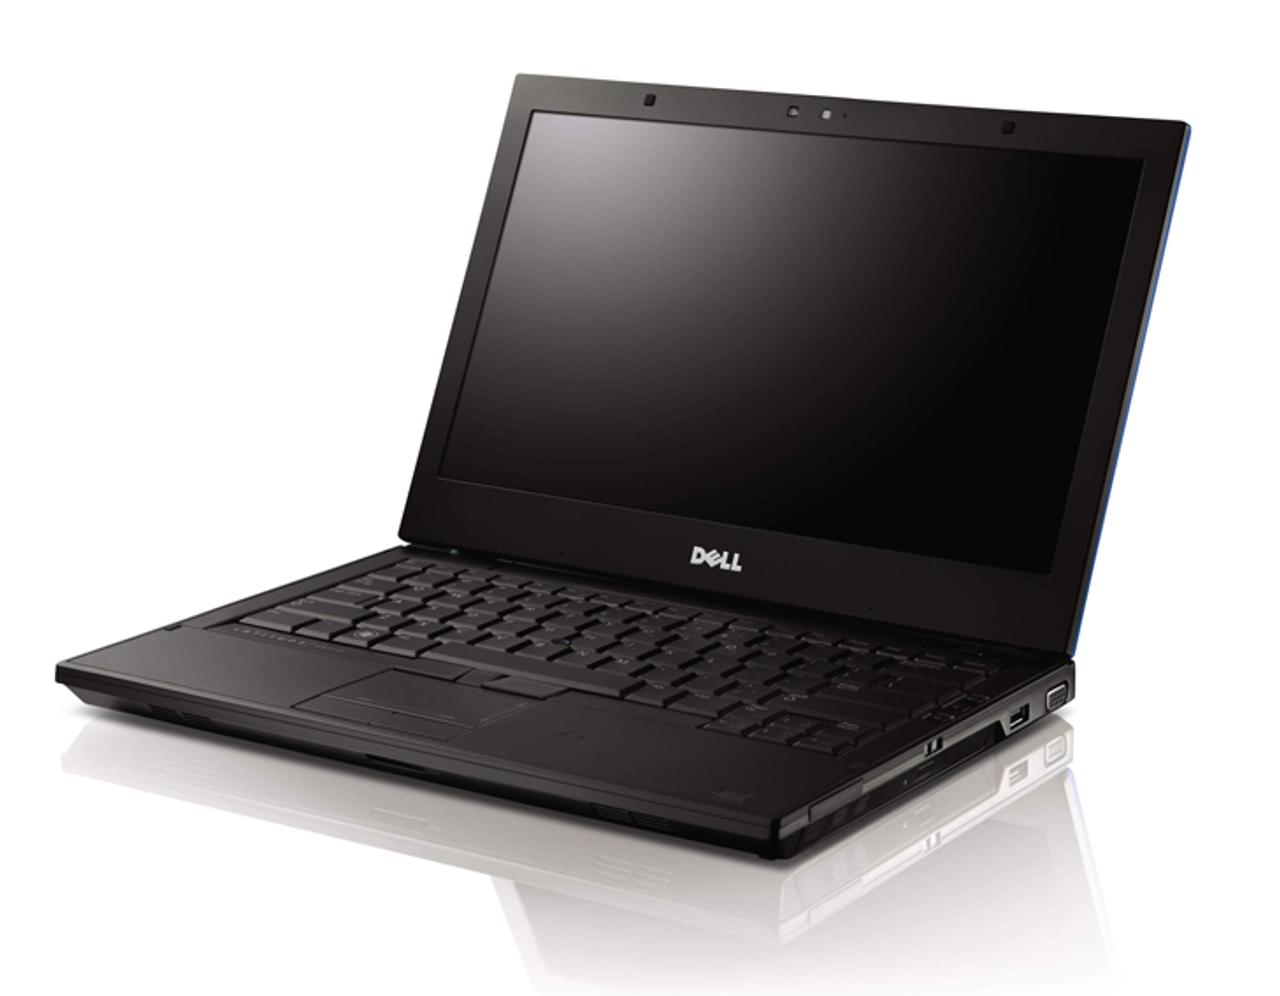 Dell Latitude E4310 Laptop Core i5 2.4GHz, 4GB Ram, 160GB HDD, DVD-RW, Windows 7 Pro 64 Notebook